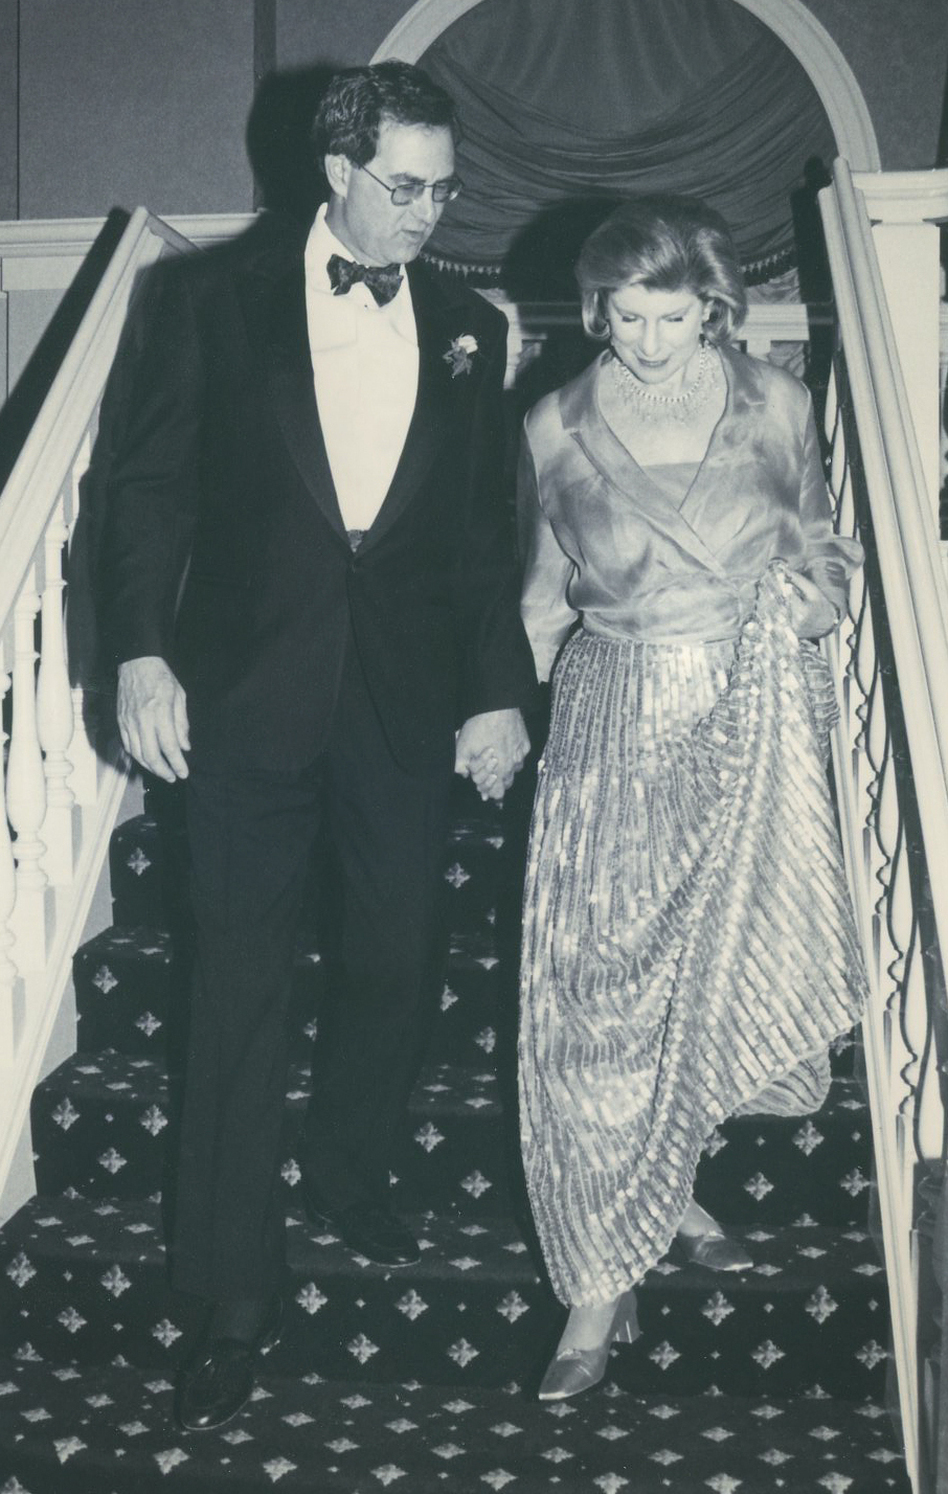 Nina Totenberg and David Reines at their wedding in 2000.